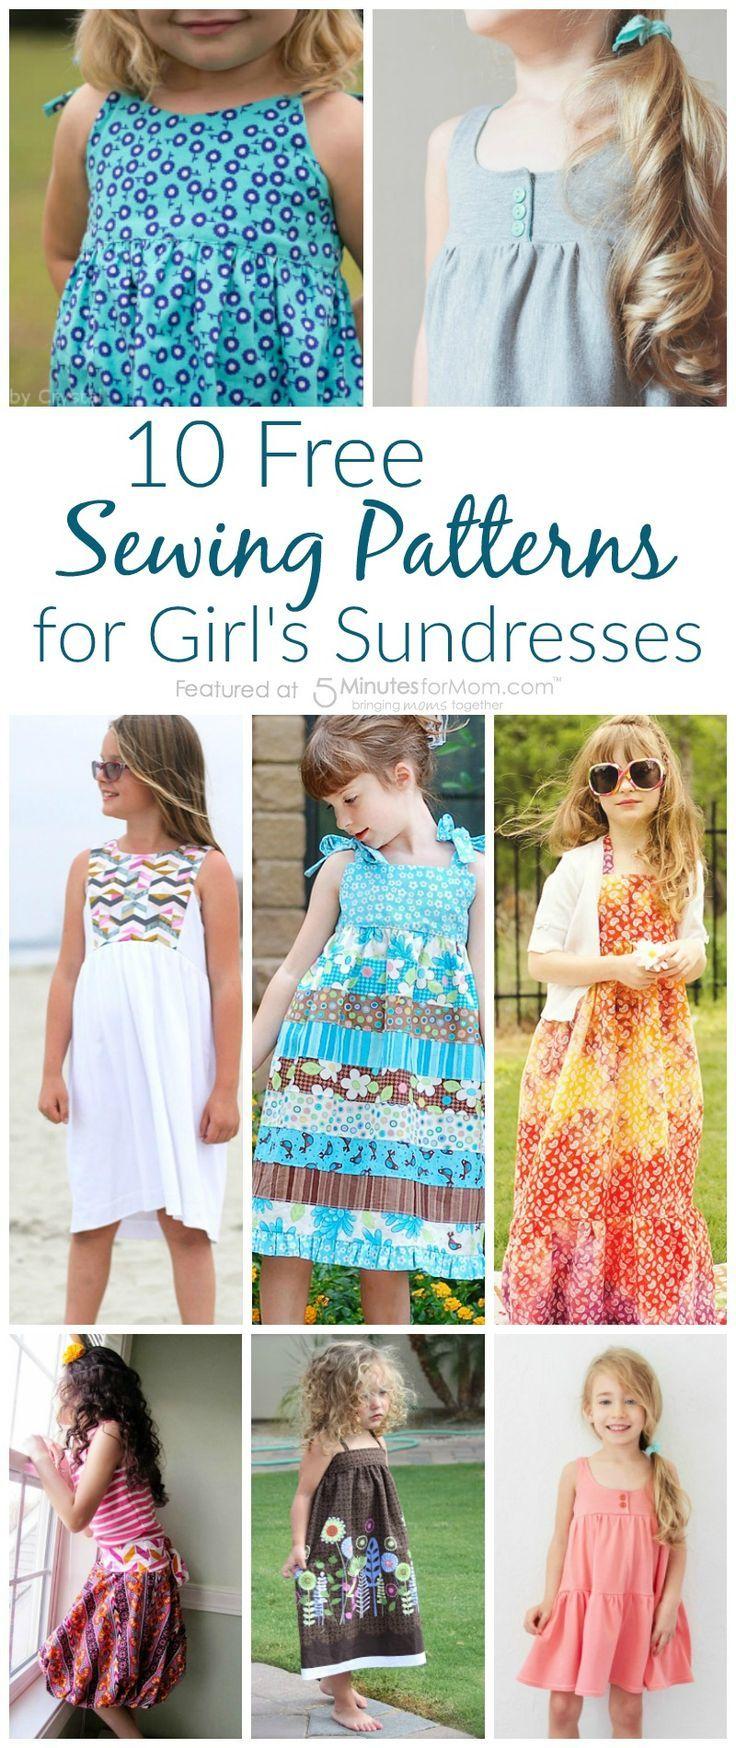 10 fabulous and free sewing patterns for girls sundresses 10 fabulous and free sewing patterns for girls sundresses jeuxipadfo Gallery